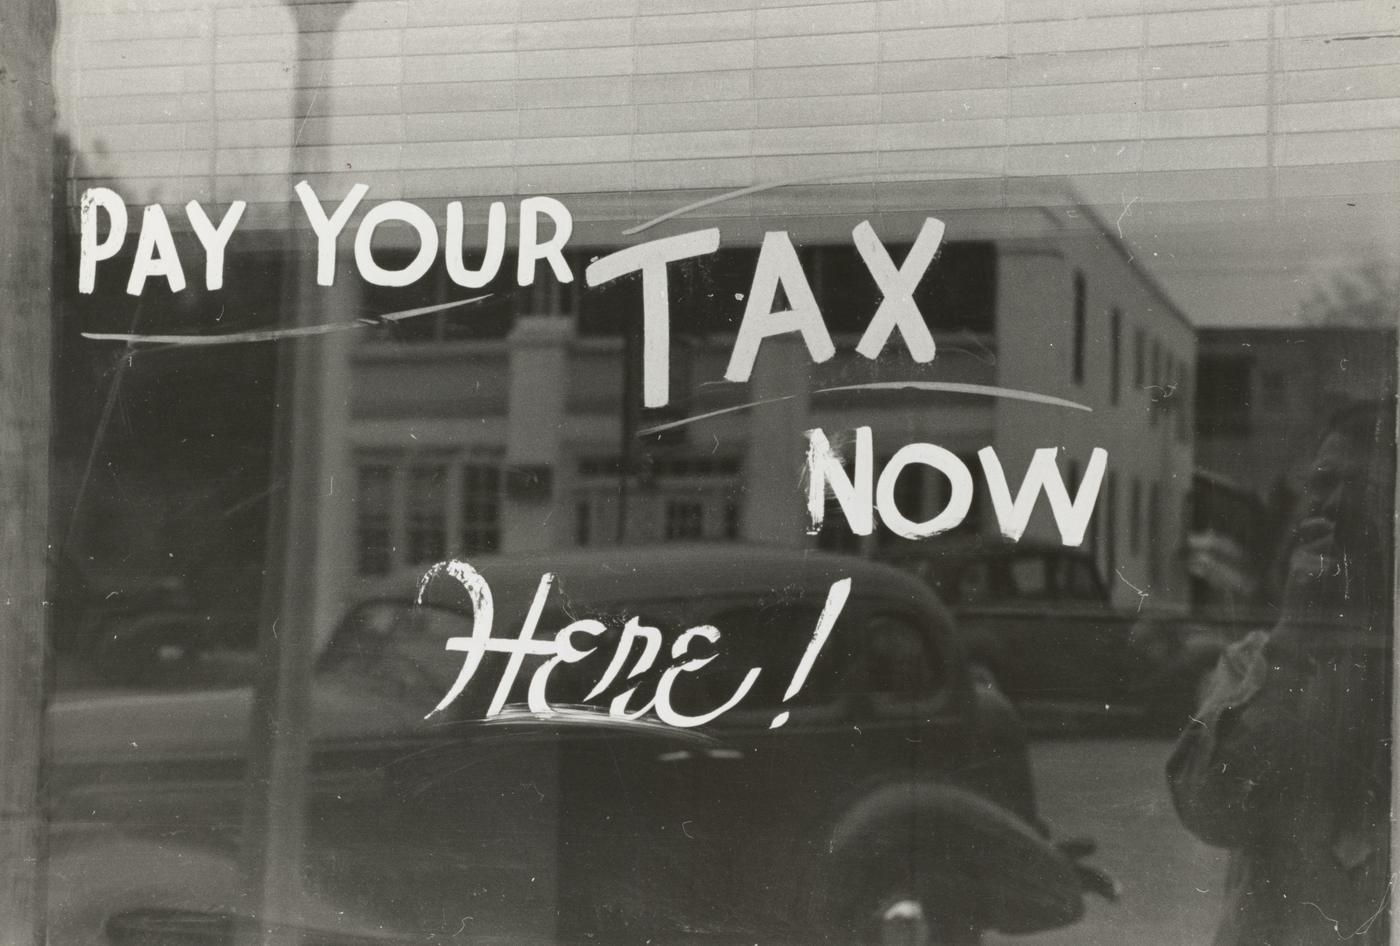 Sign, Harlingen, Texas. 1939. Photographer Lee Russell